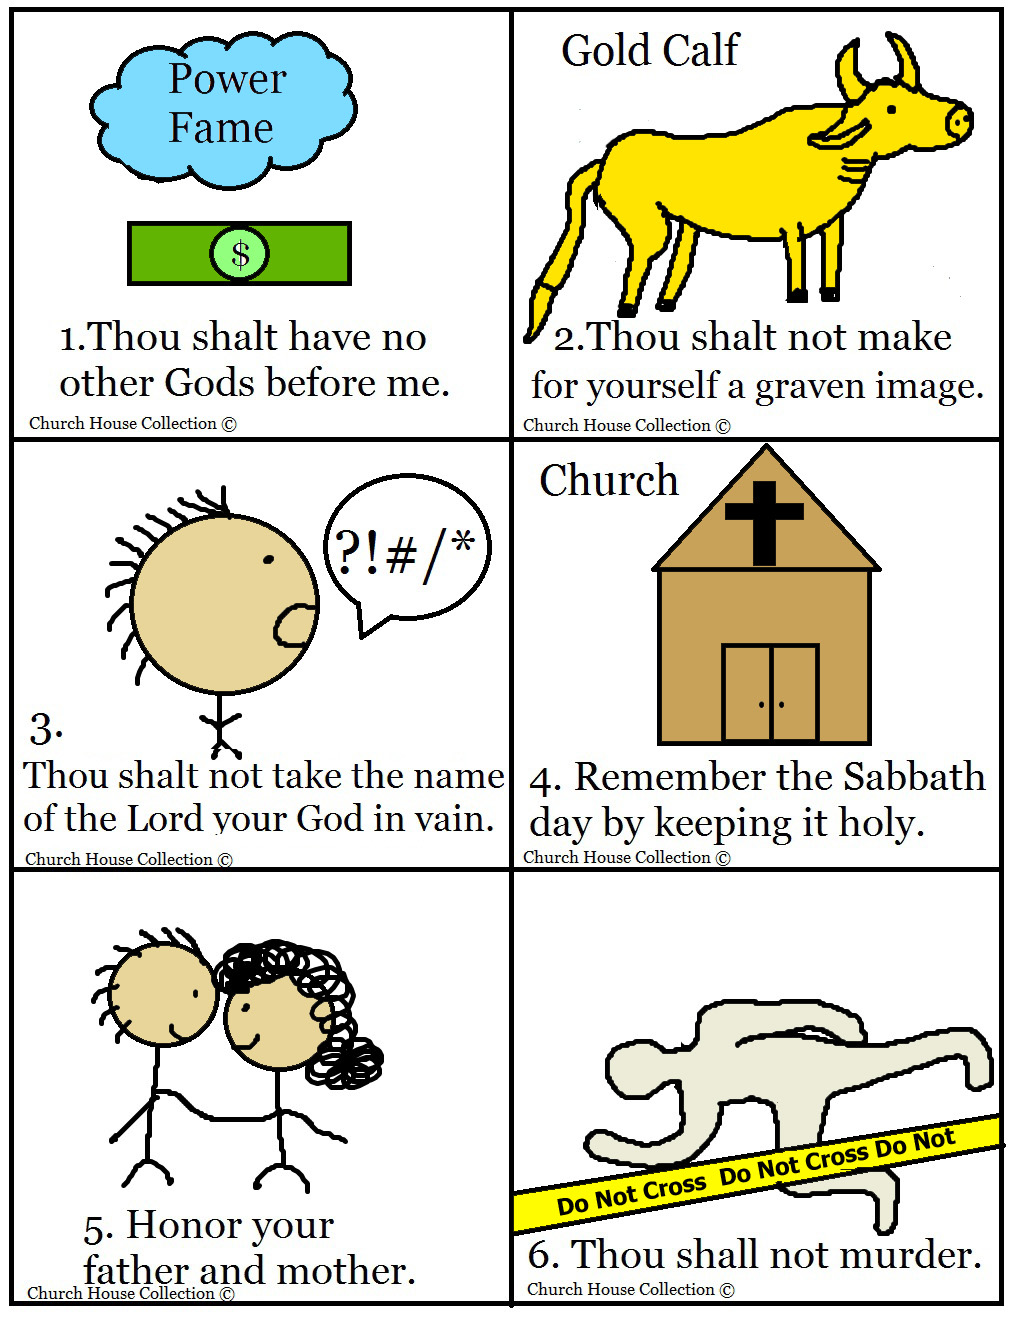 10 commandments bible matching game